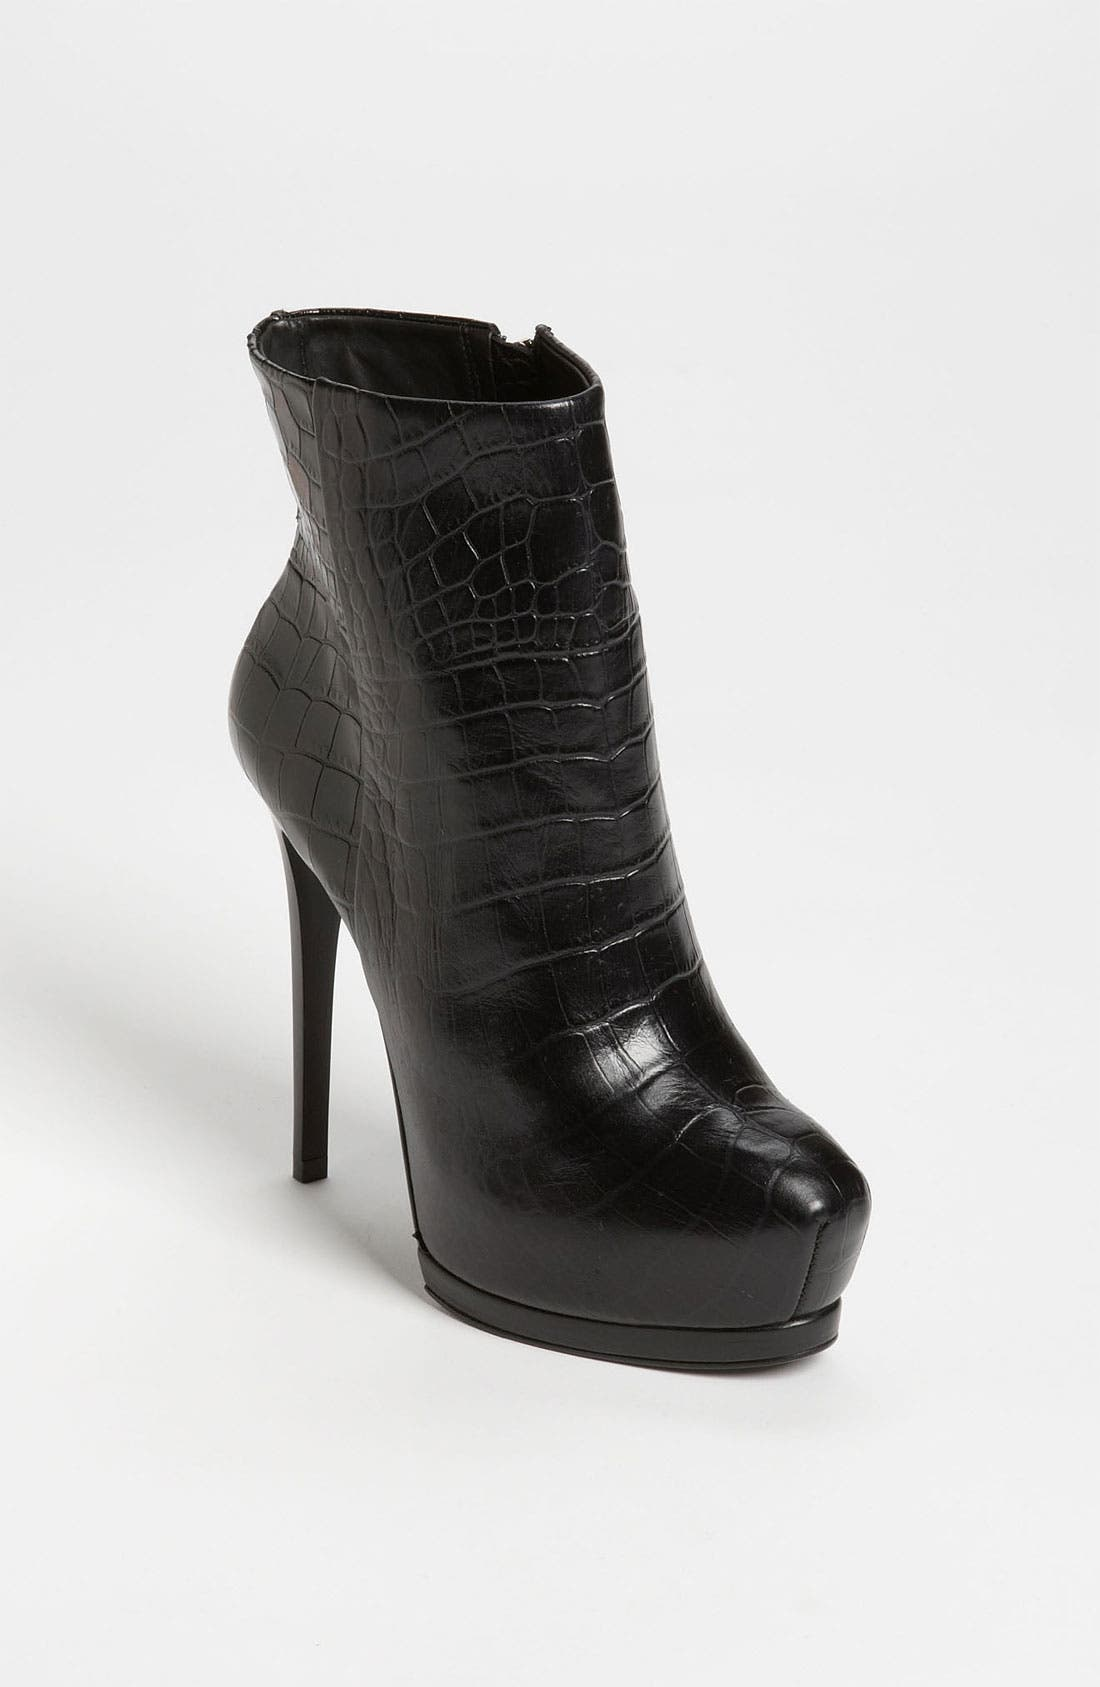 Alternate Image 1 Selected - Pour la Victoire 'Volkova' Boot